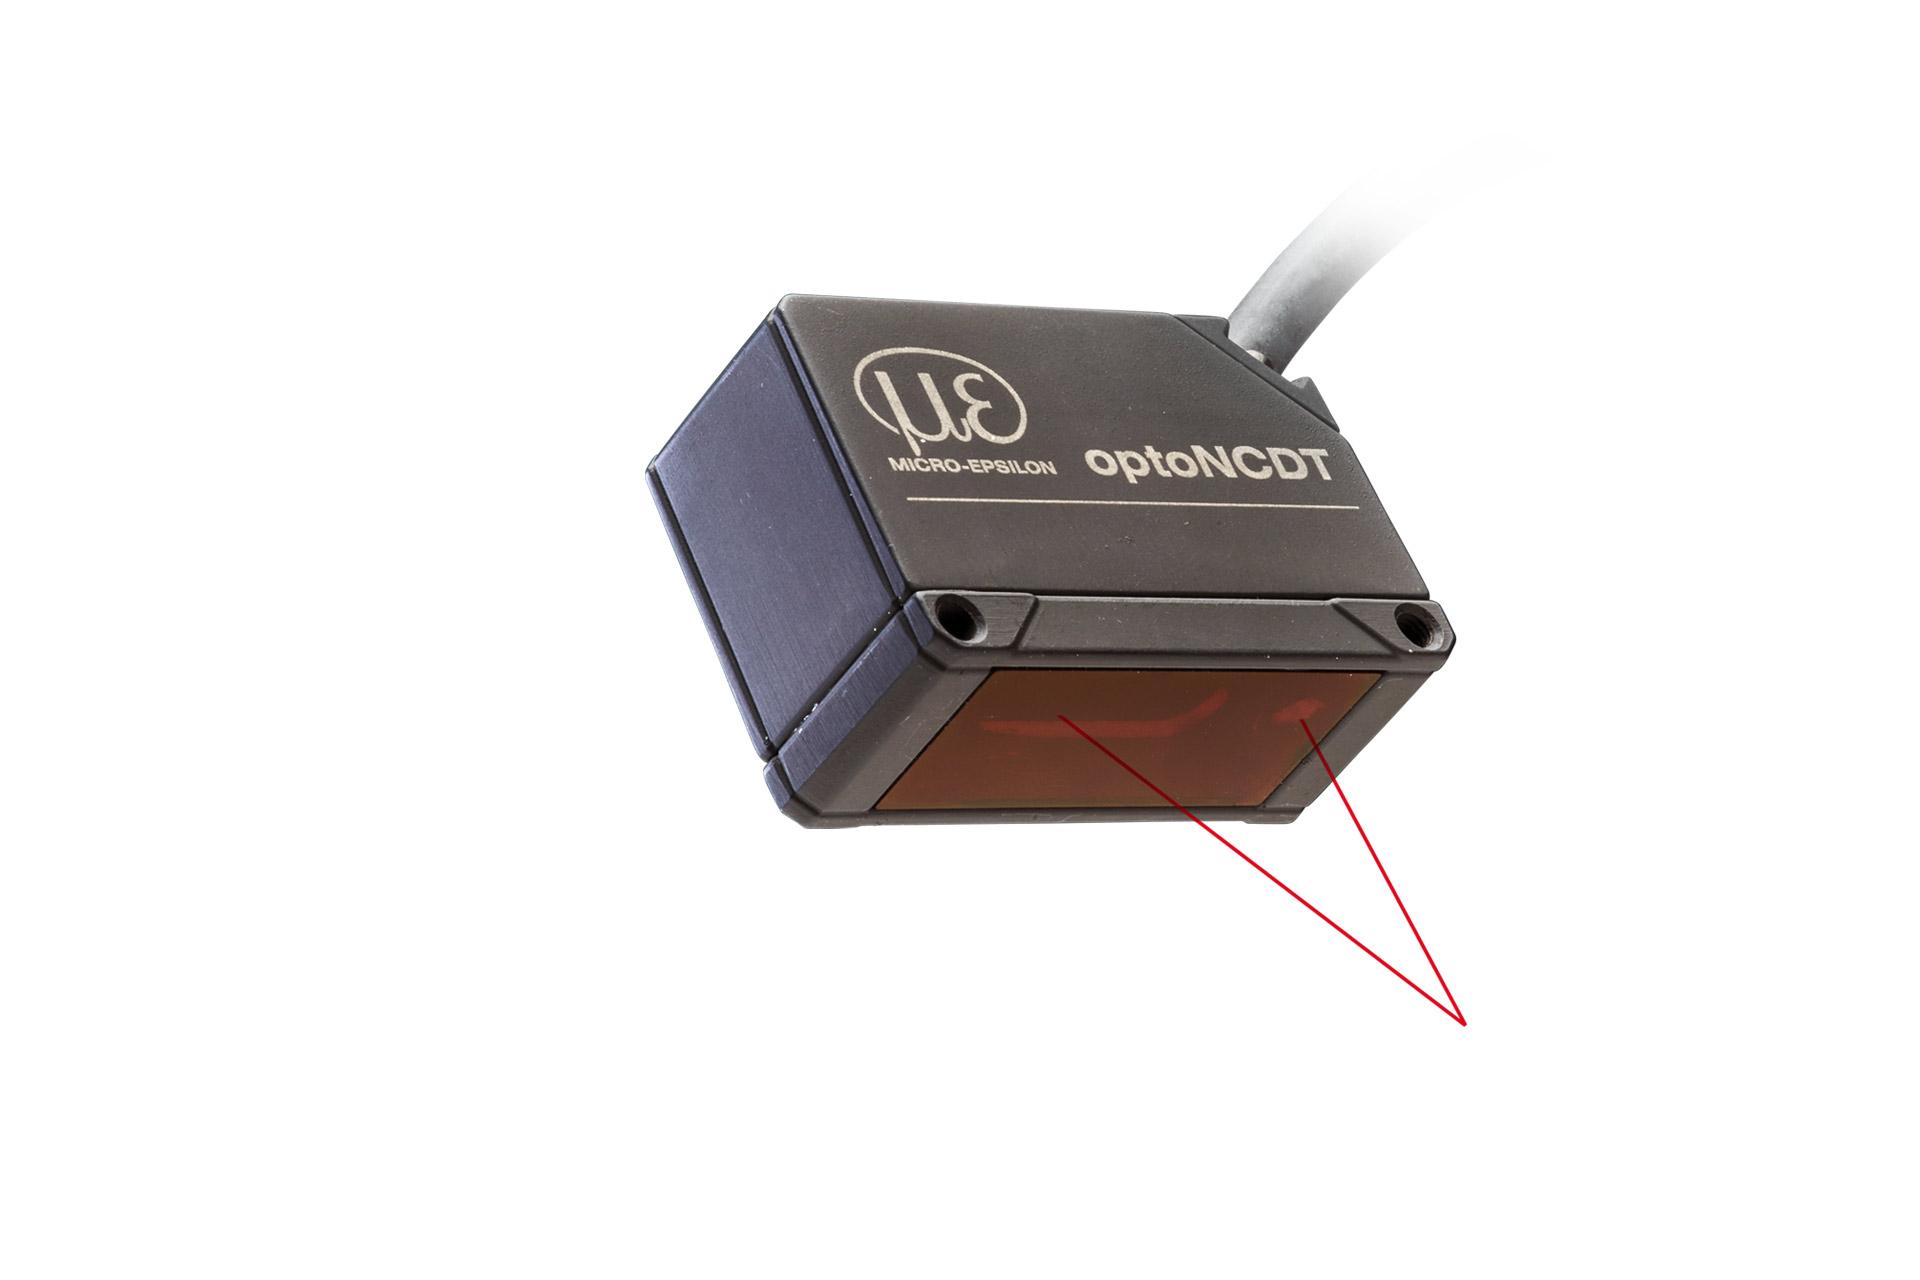 ILD1220-10 Miniatur-Laser-Wegsensor